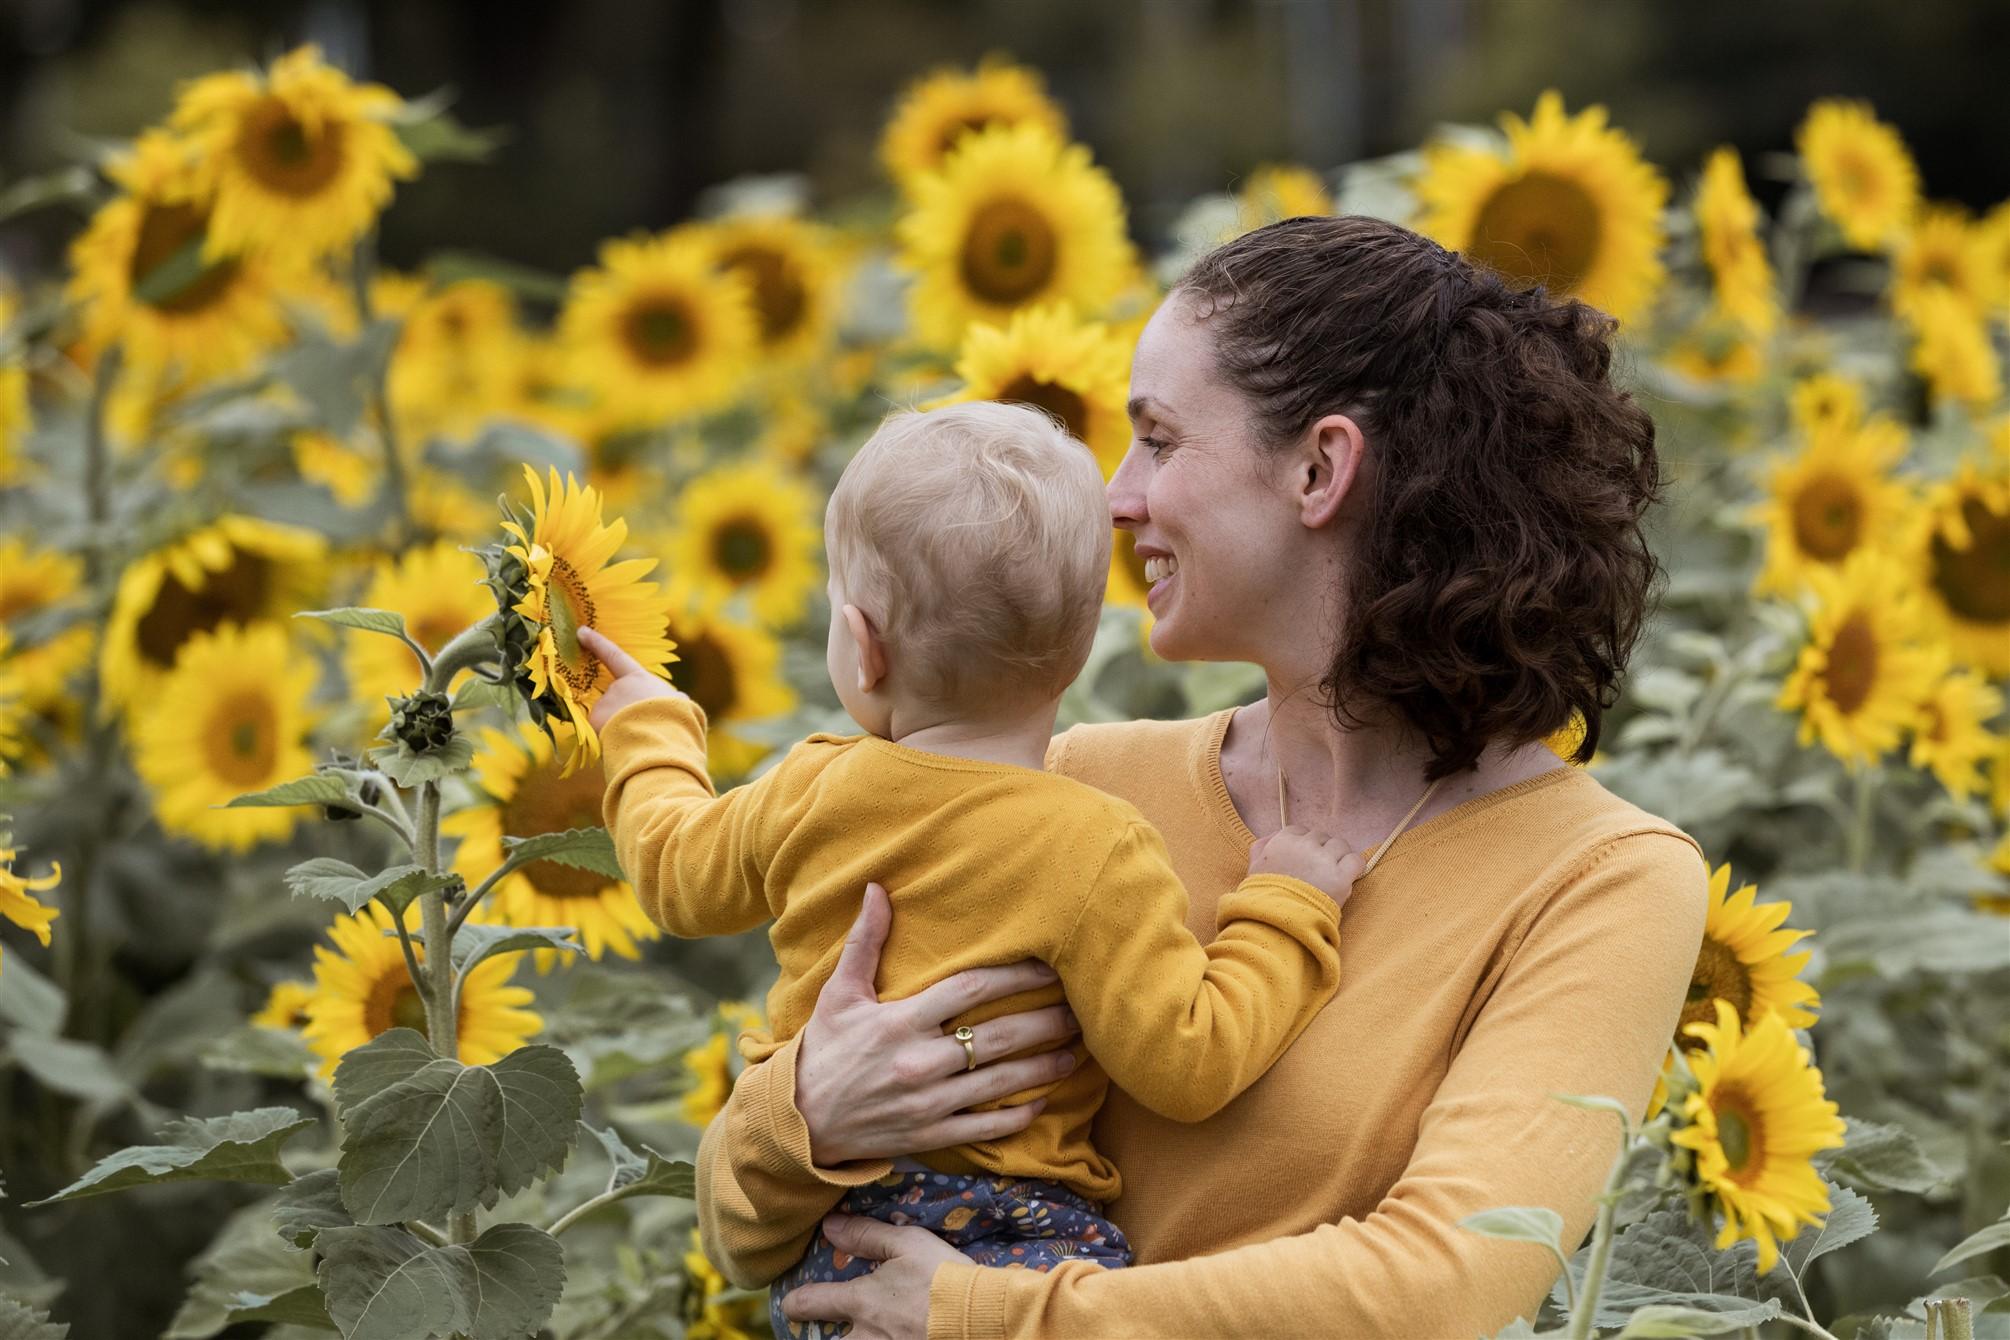 Familien Fotoshooting in Basel - Familienfotoshooting inmitten von Blumen